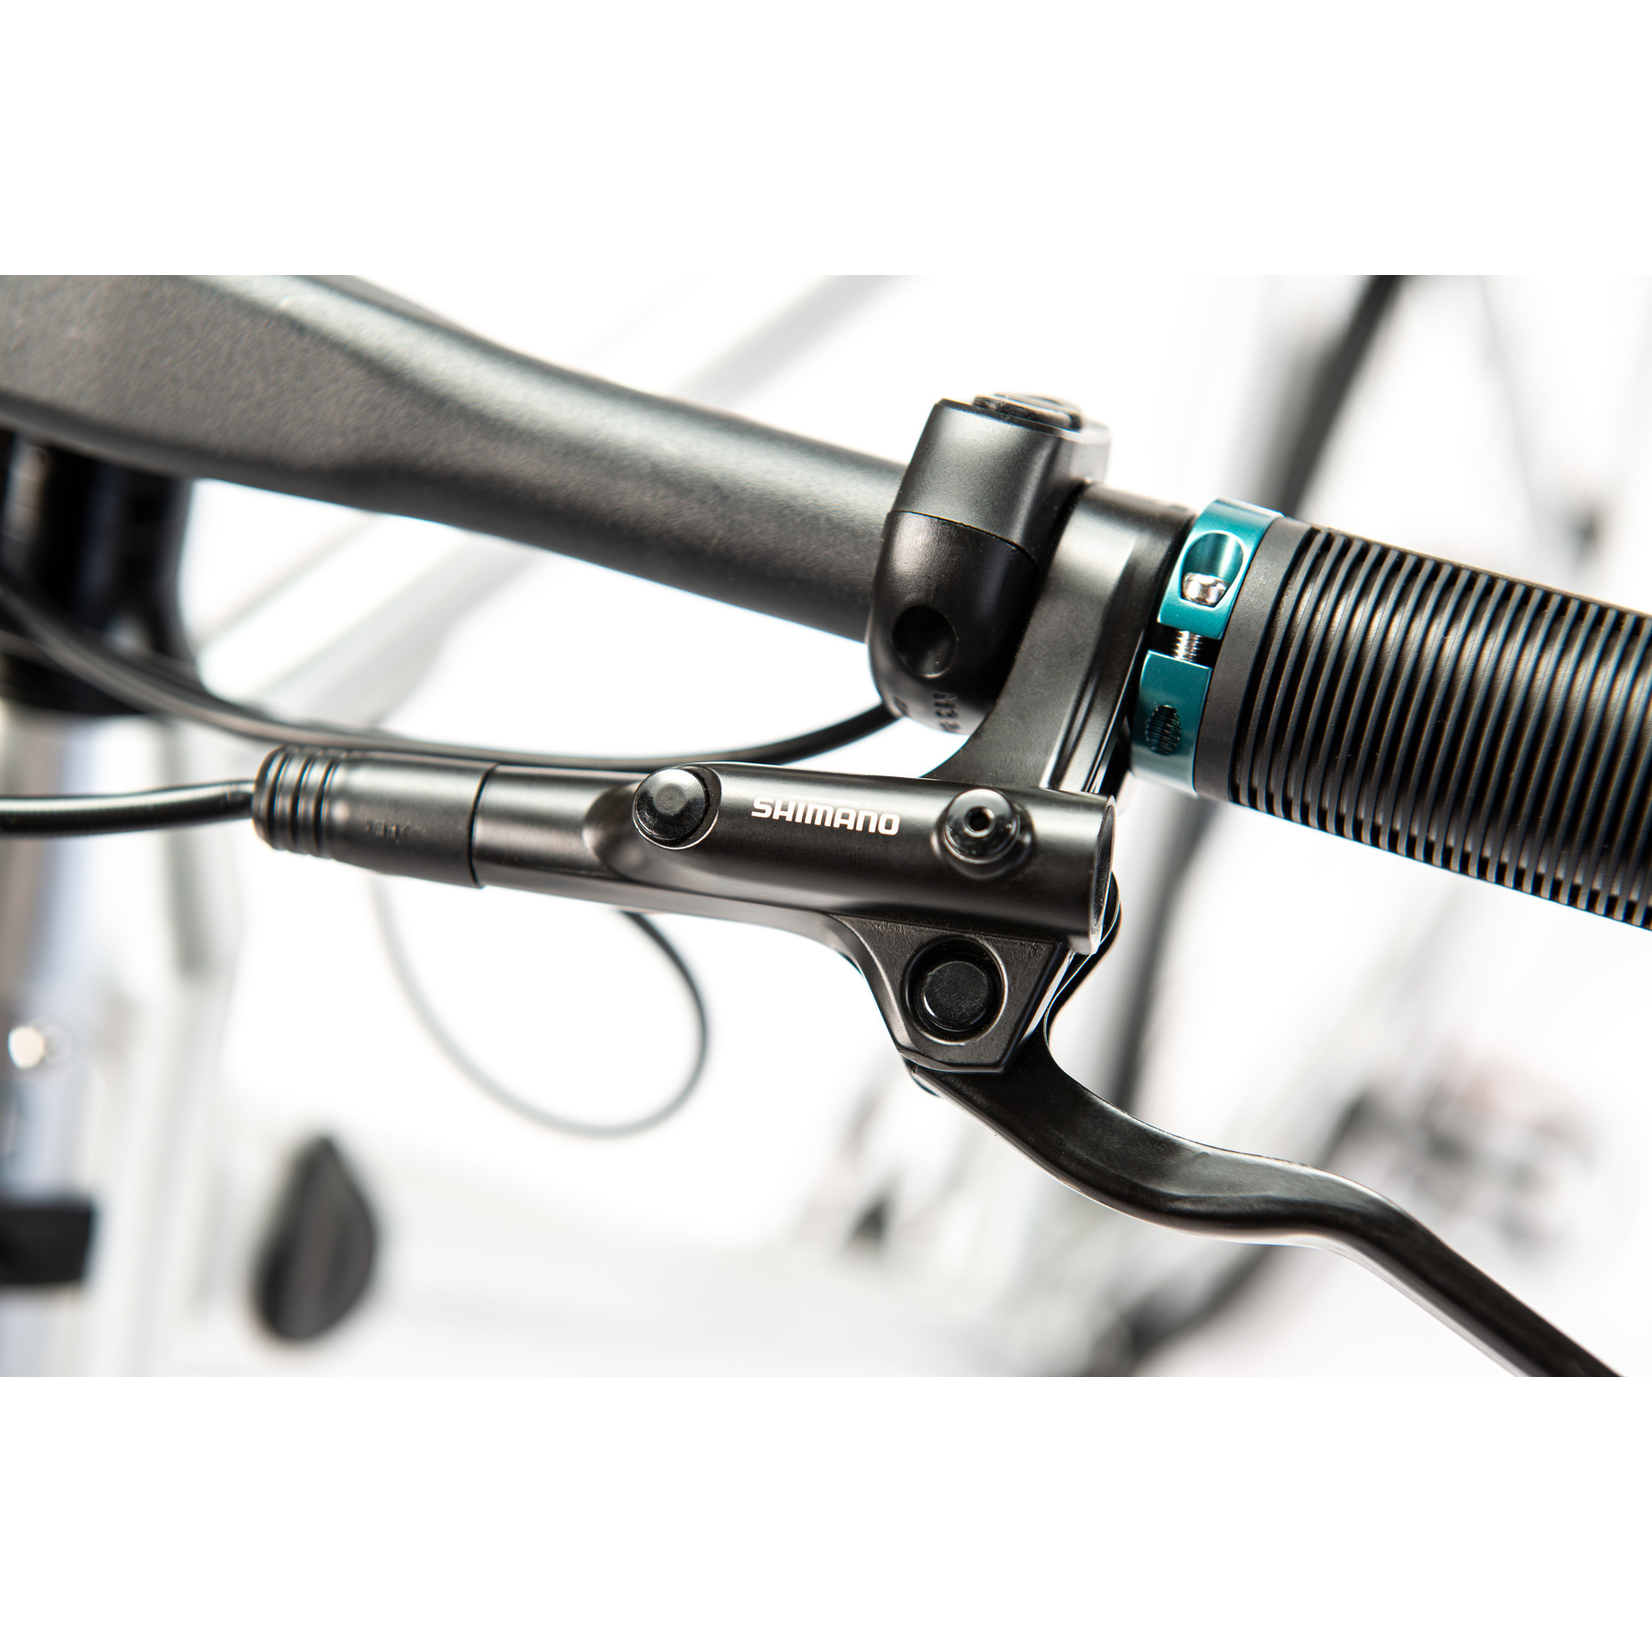 Shimano brake rear hydraulic